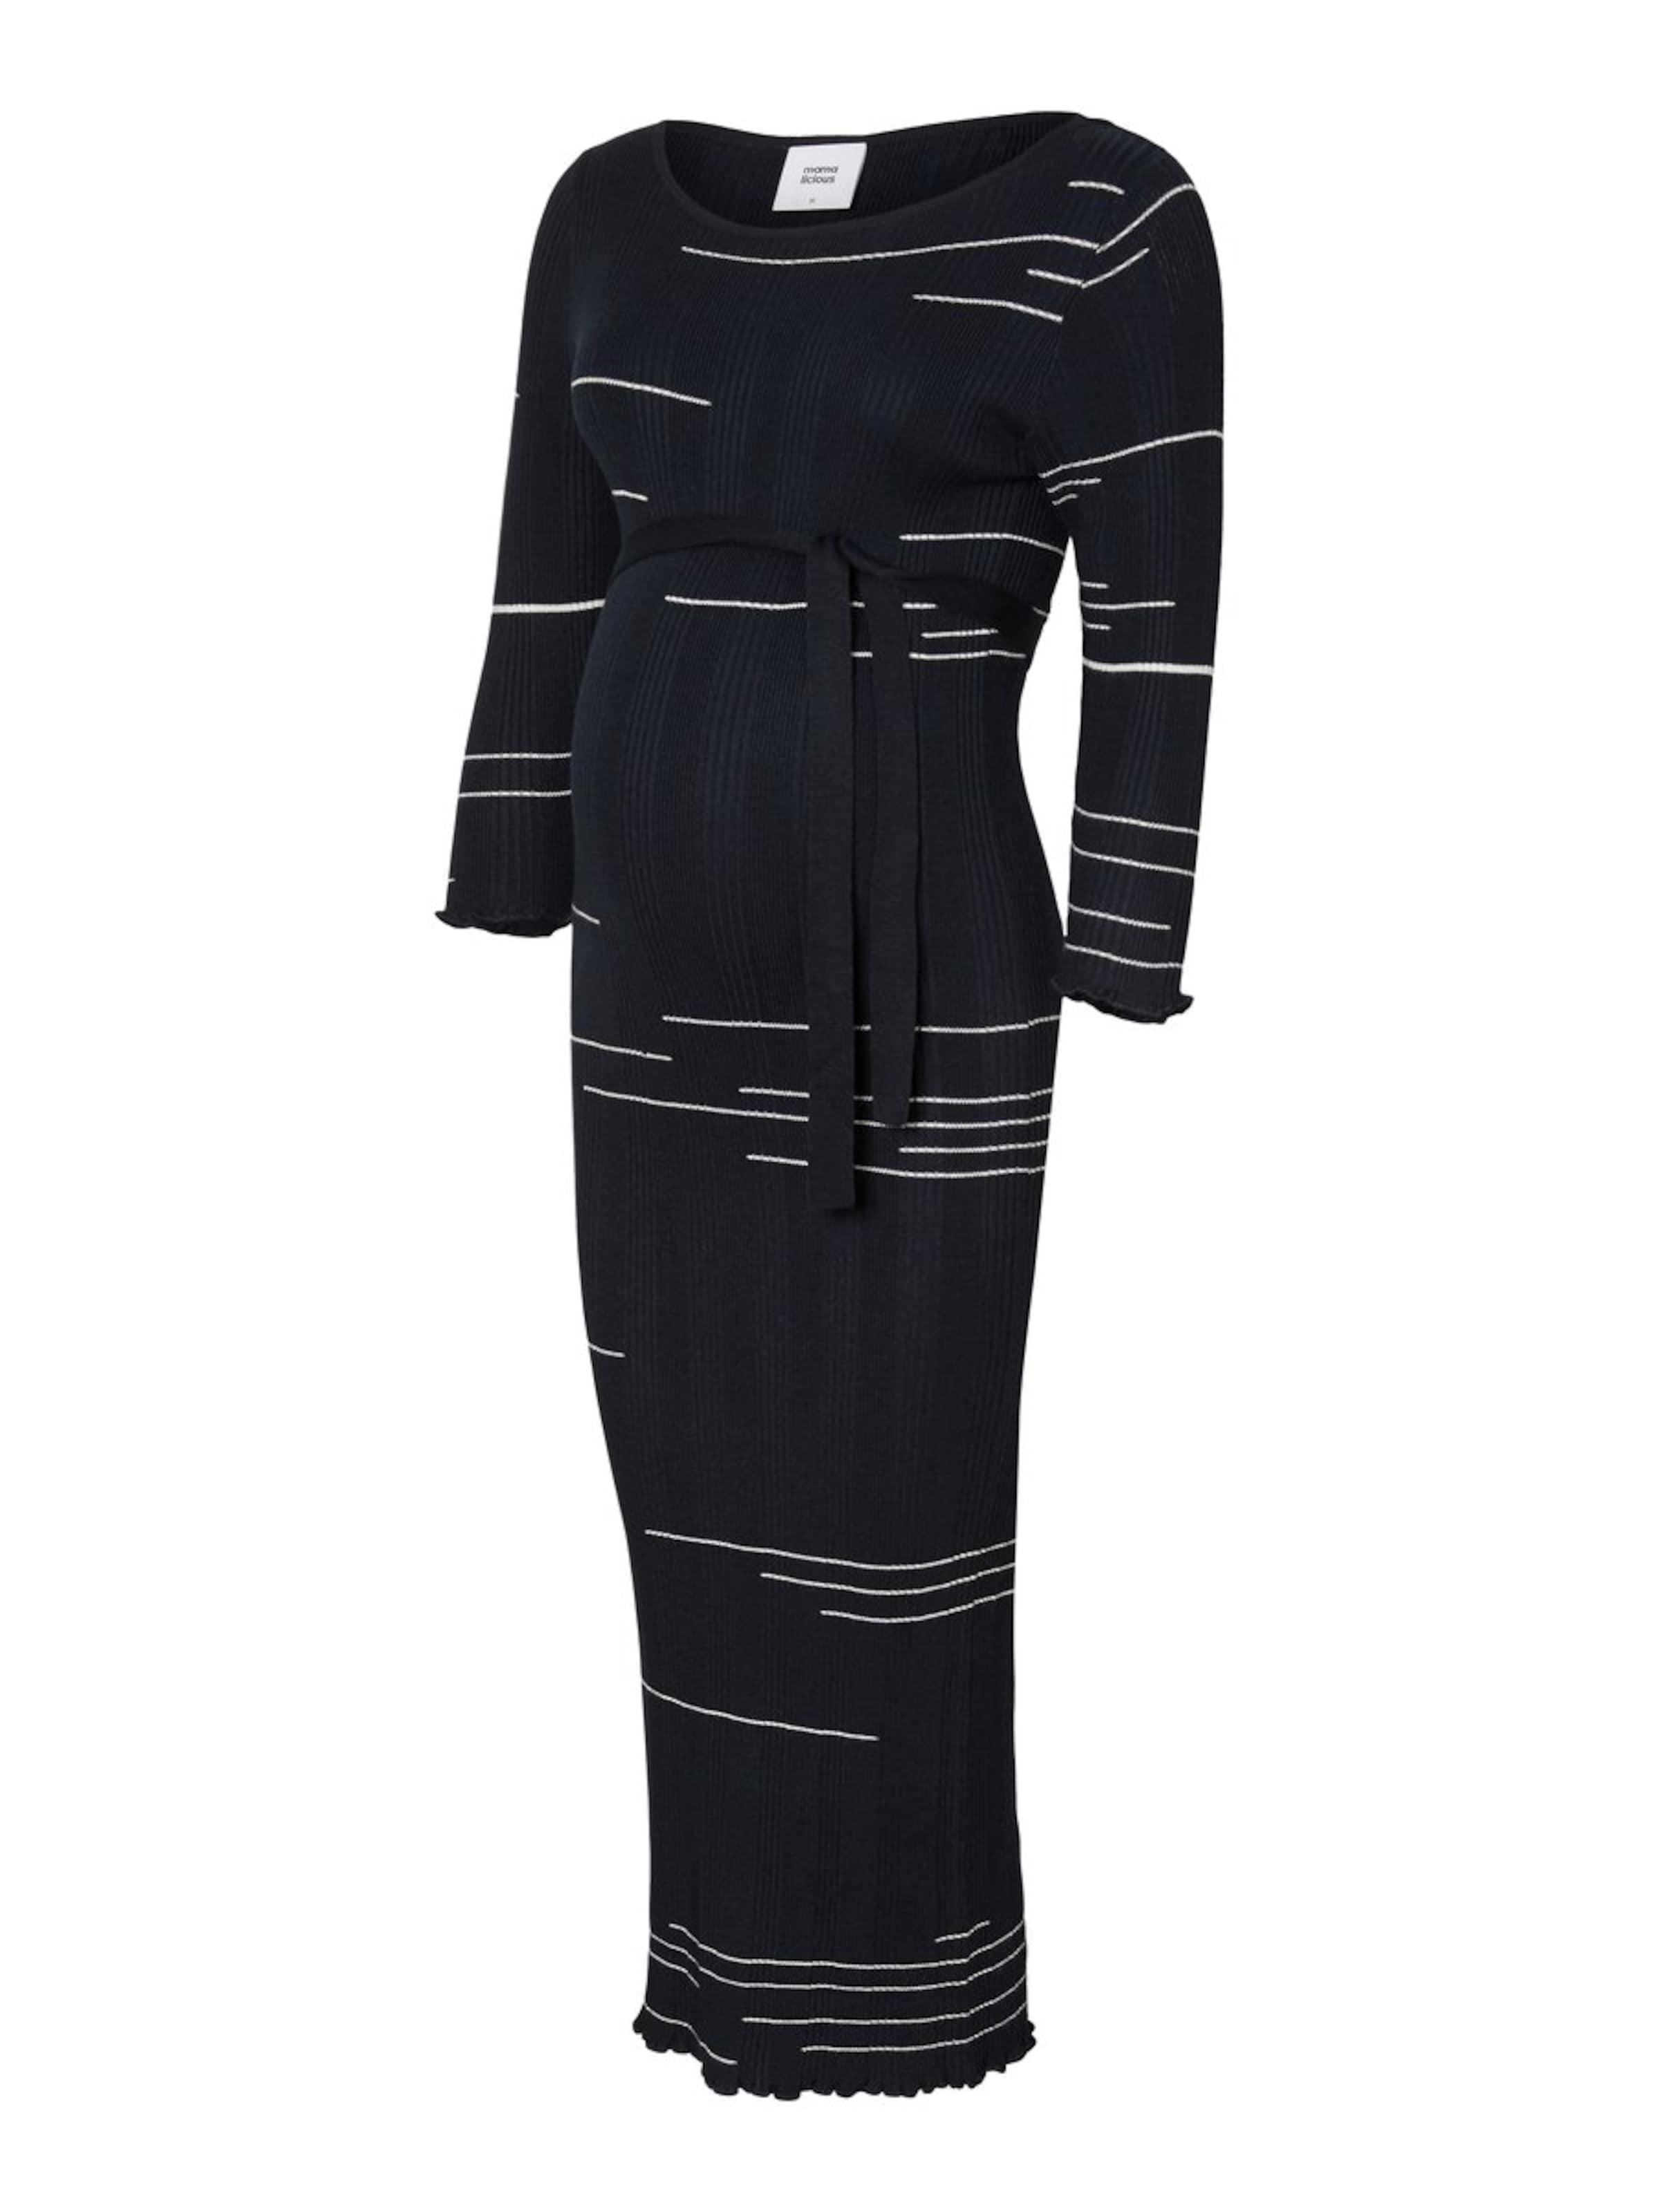 FoncéBlanc Maille Robes En Bleu Mamalicious lJKc1F